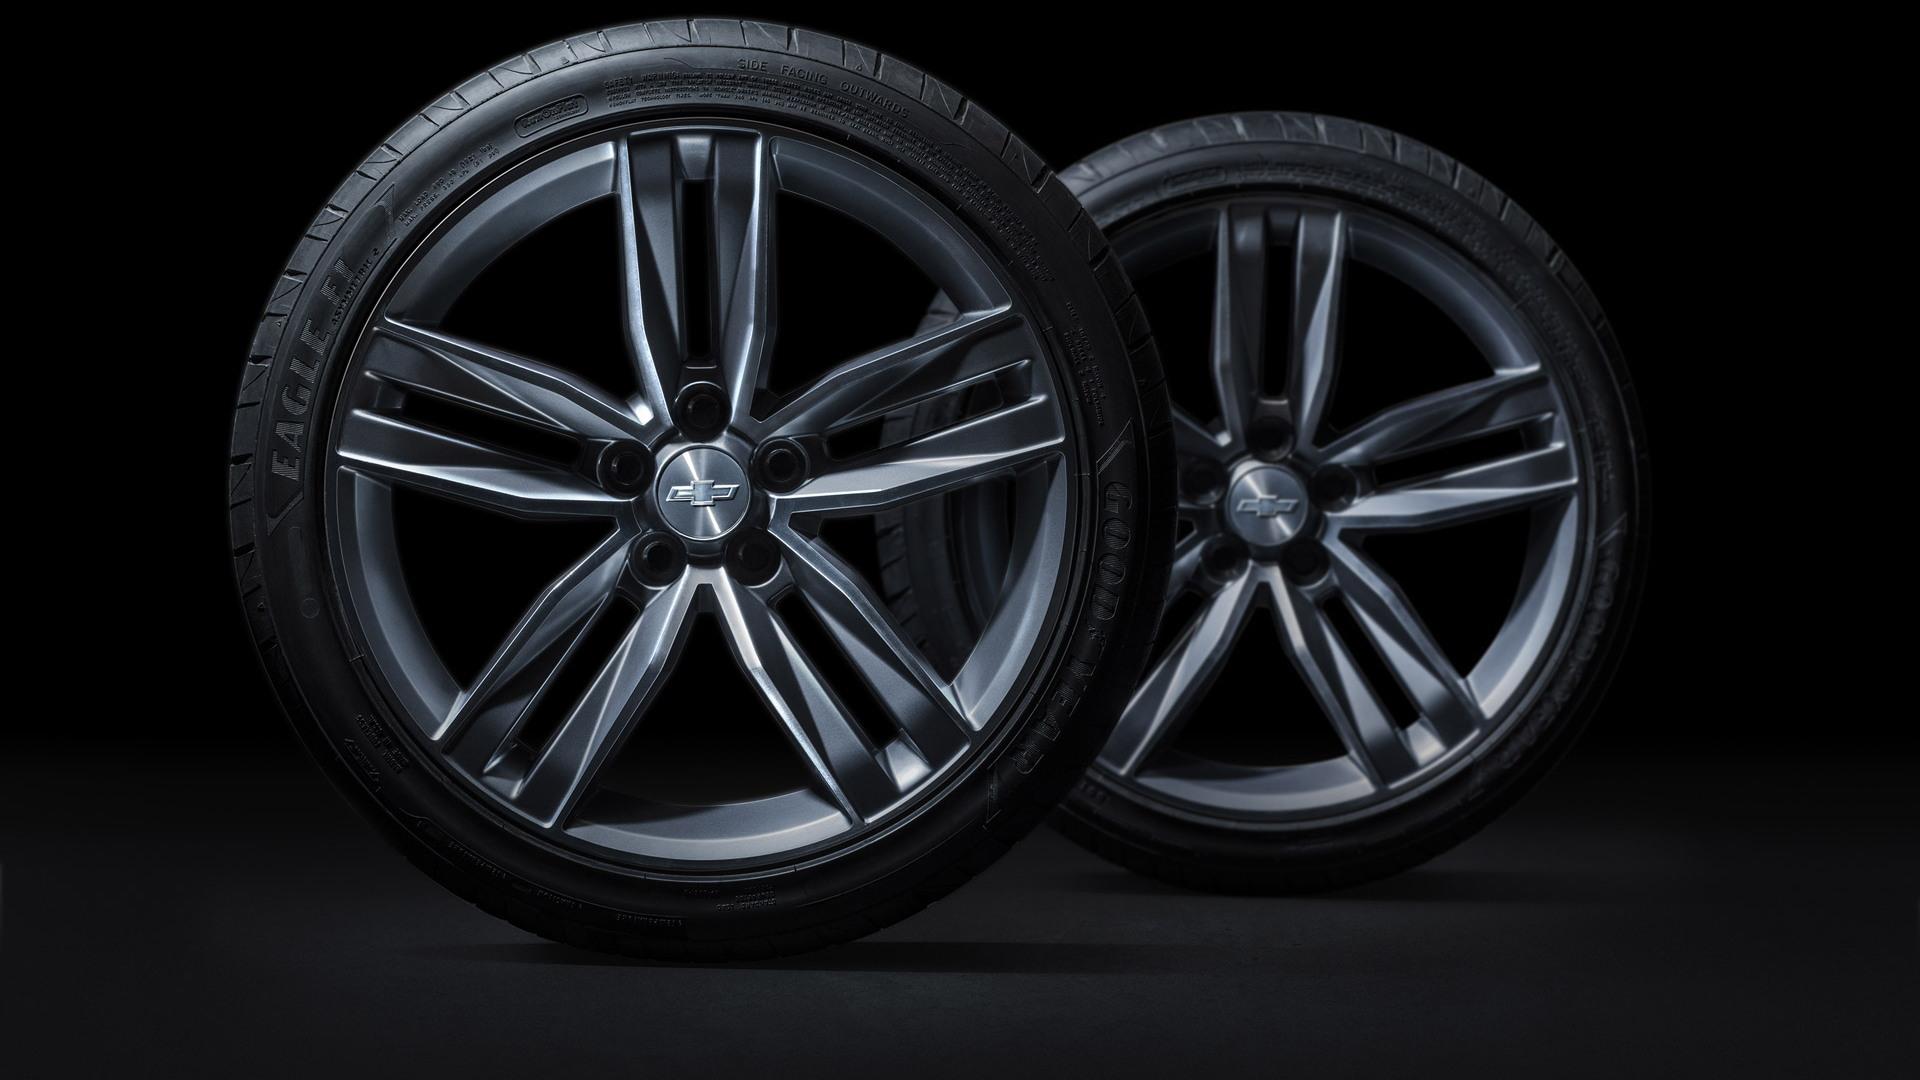 2016 Chevrolet Camaro's wheels